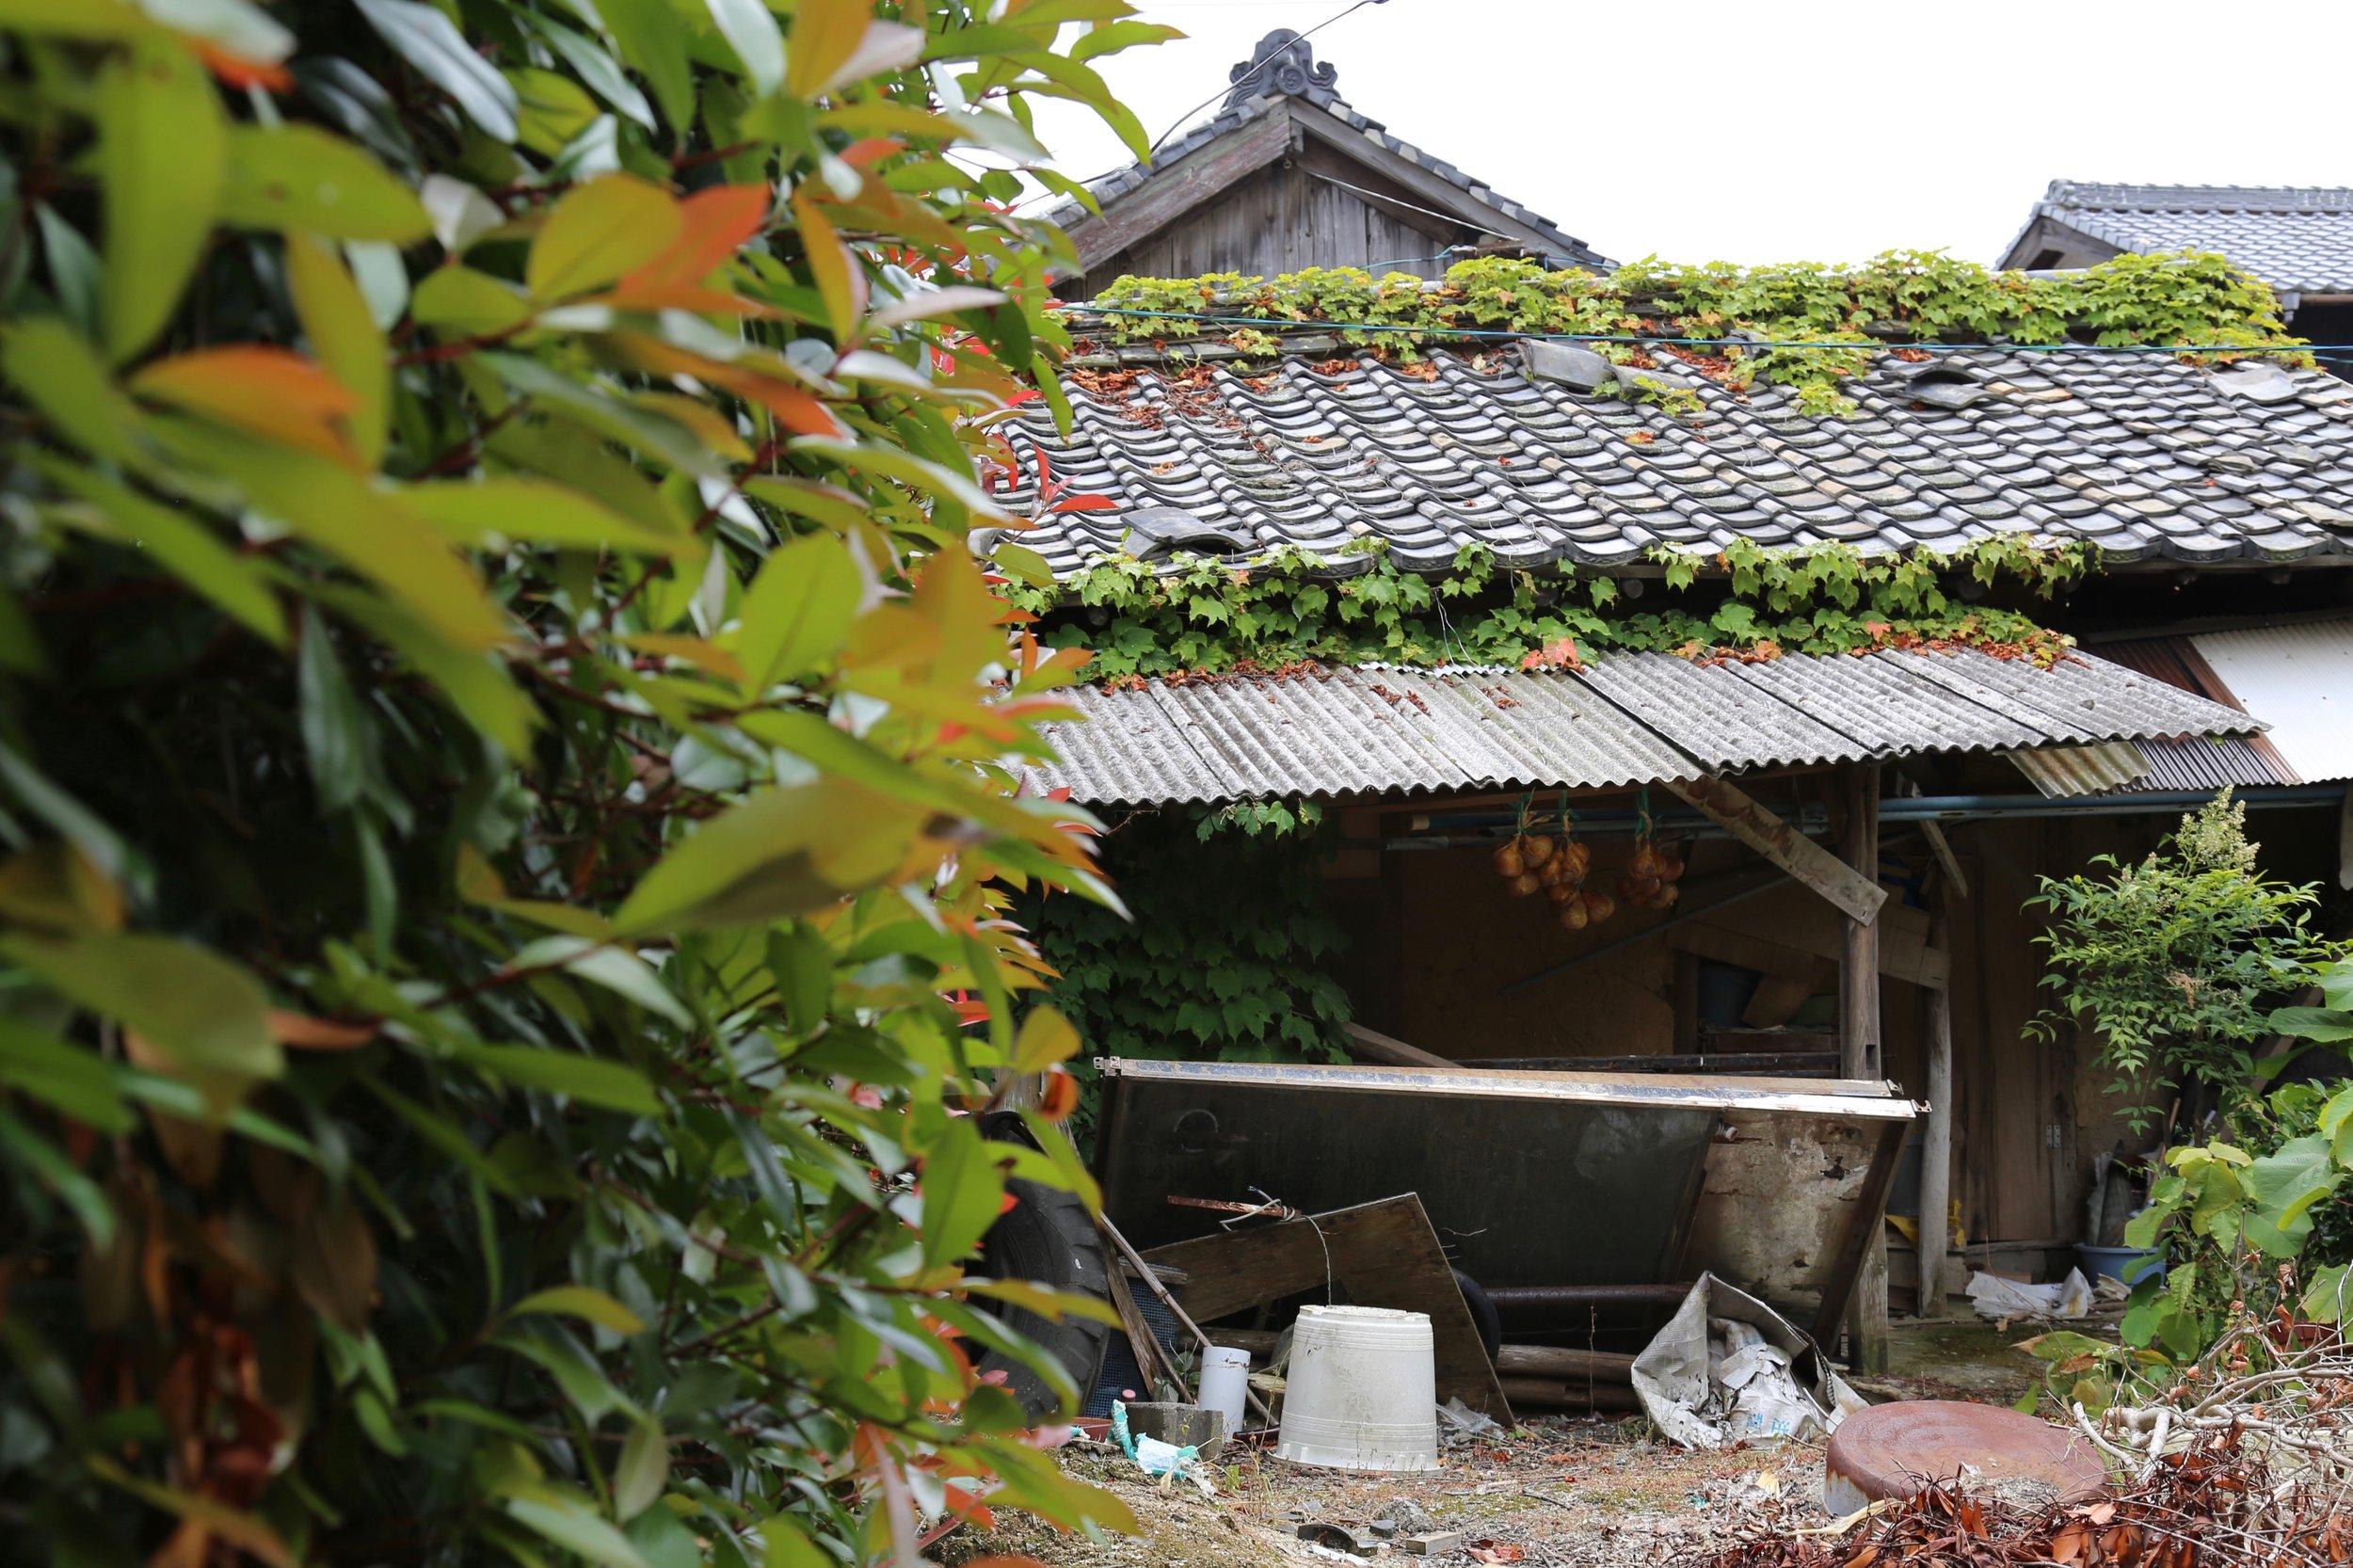 suo-oshima-farm-house